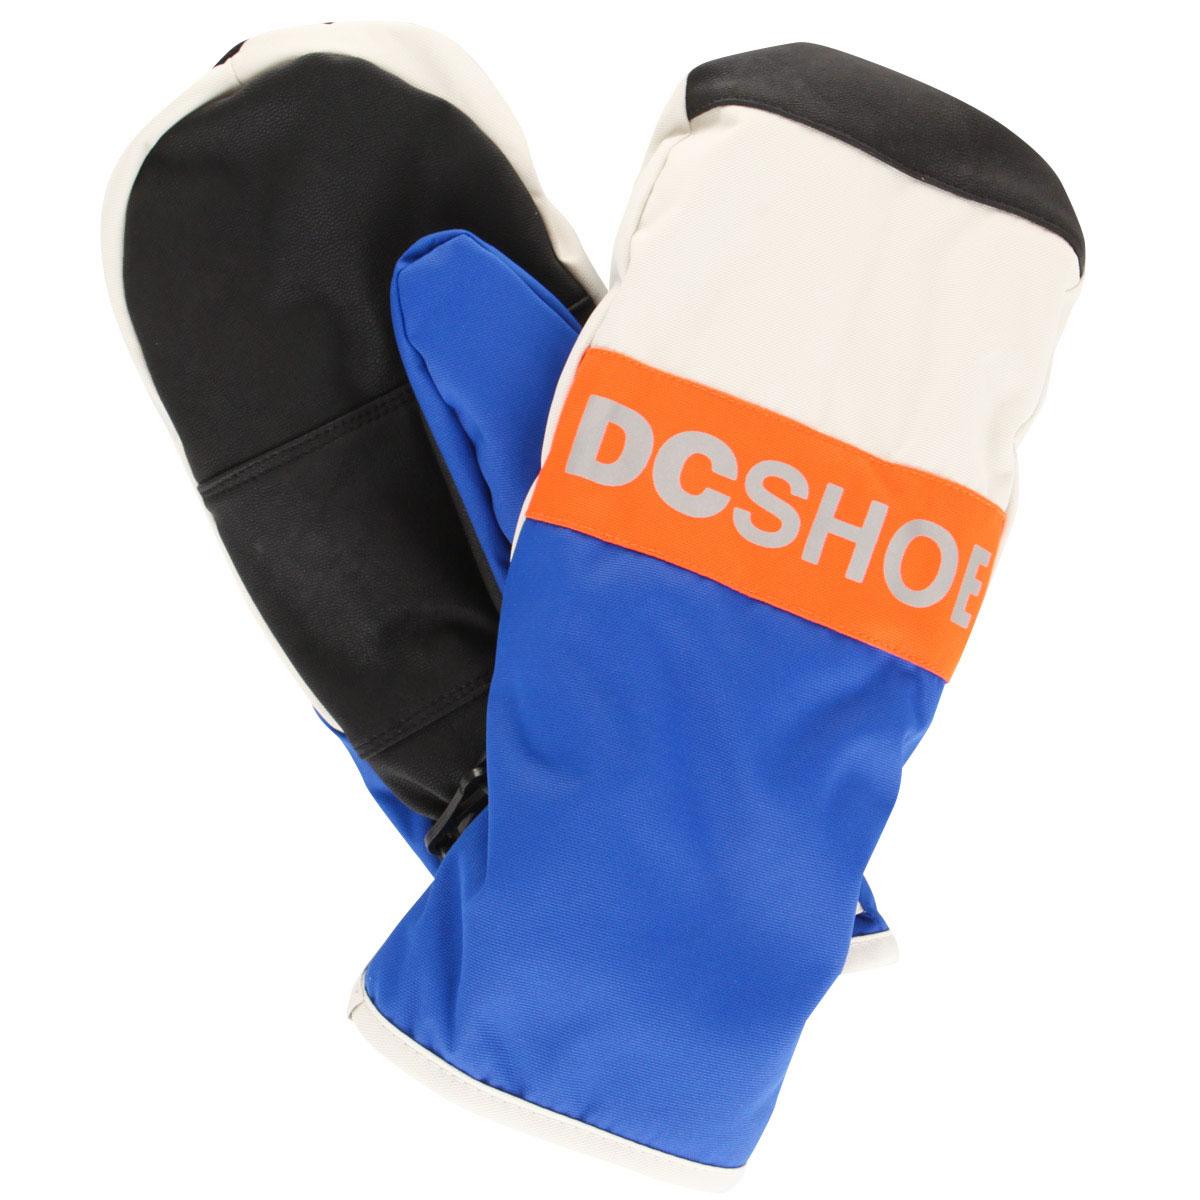 31131147a94b Купить варежки сноубордические DC Franchise Mitt Surf The Web ...